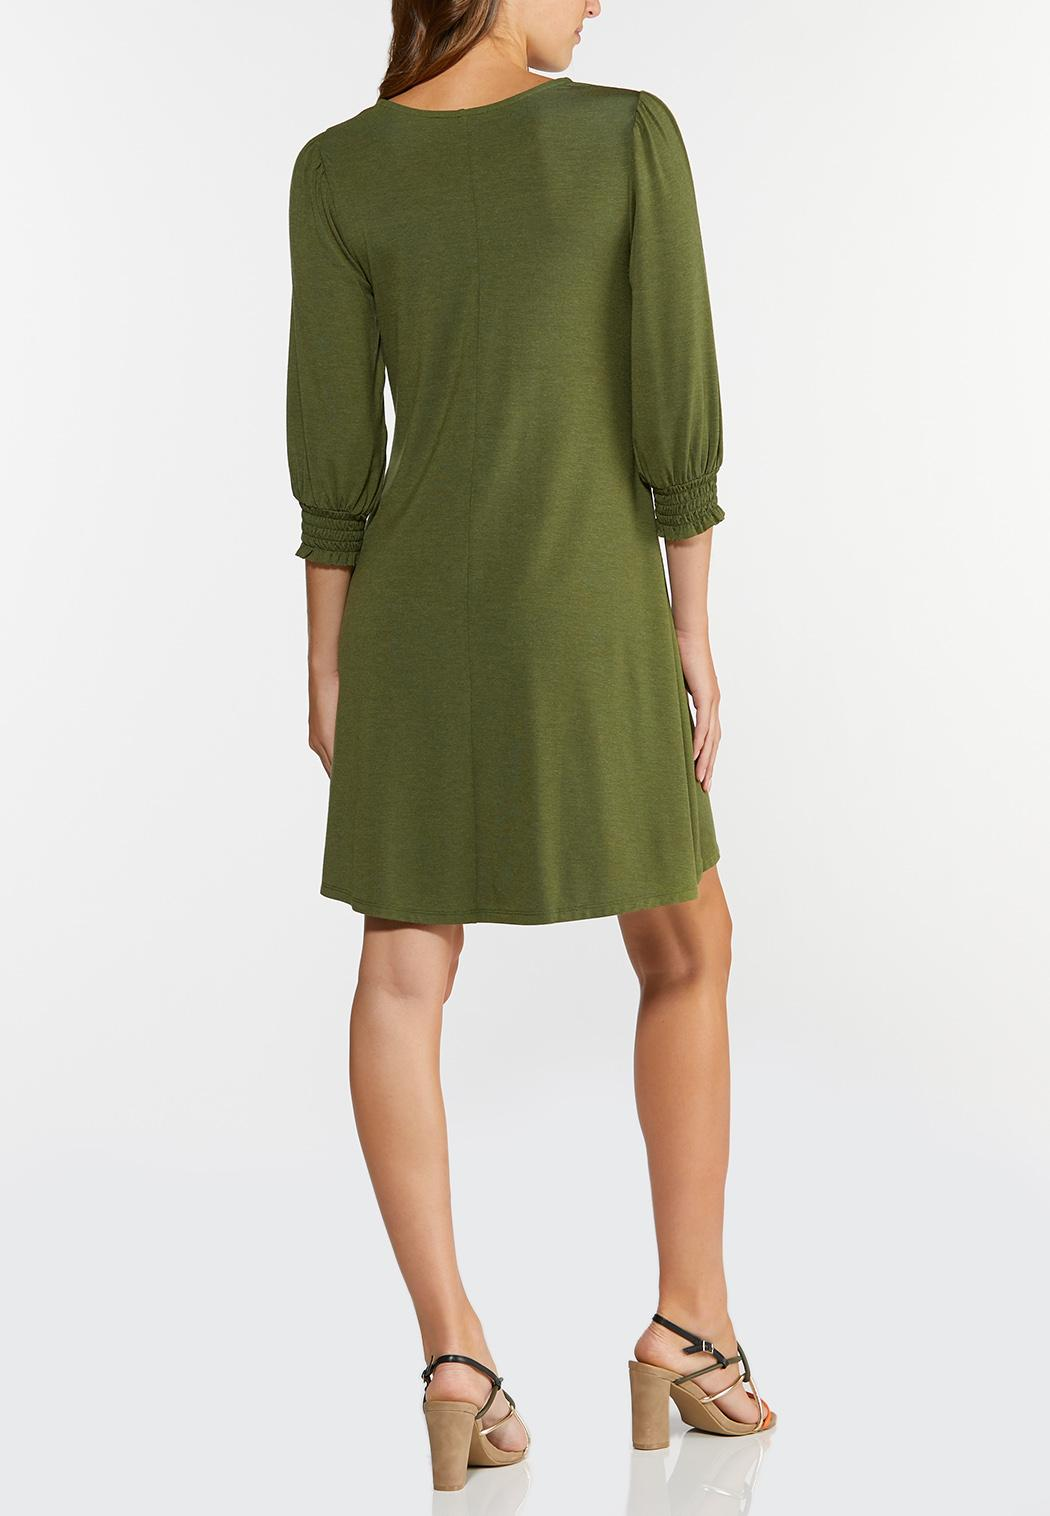 Smocked Puff Sleeve Dress (Item #44313359)